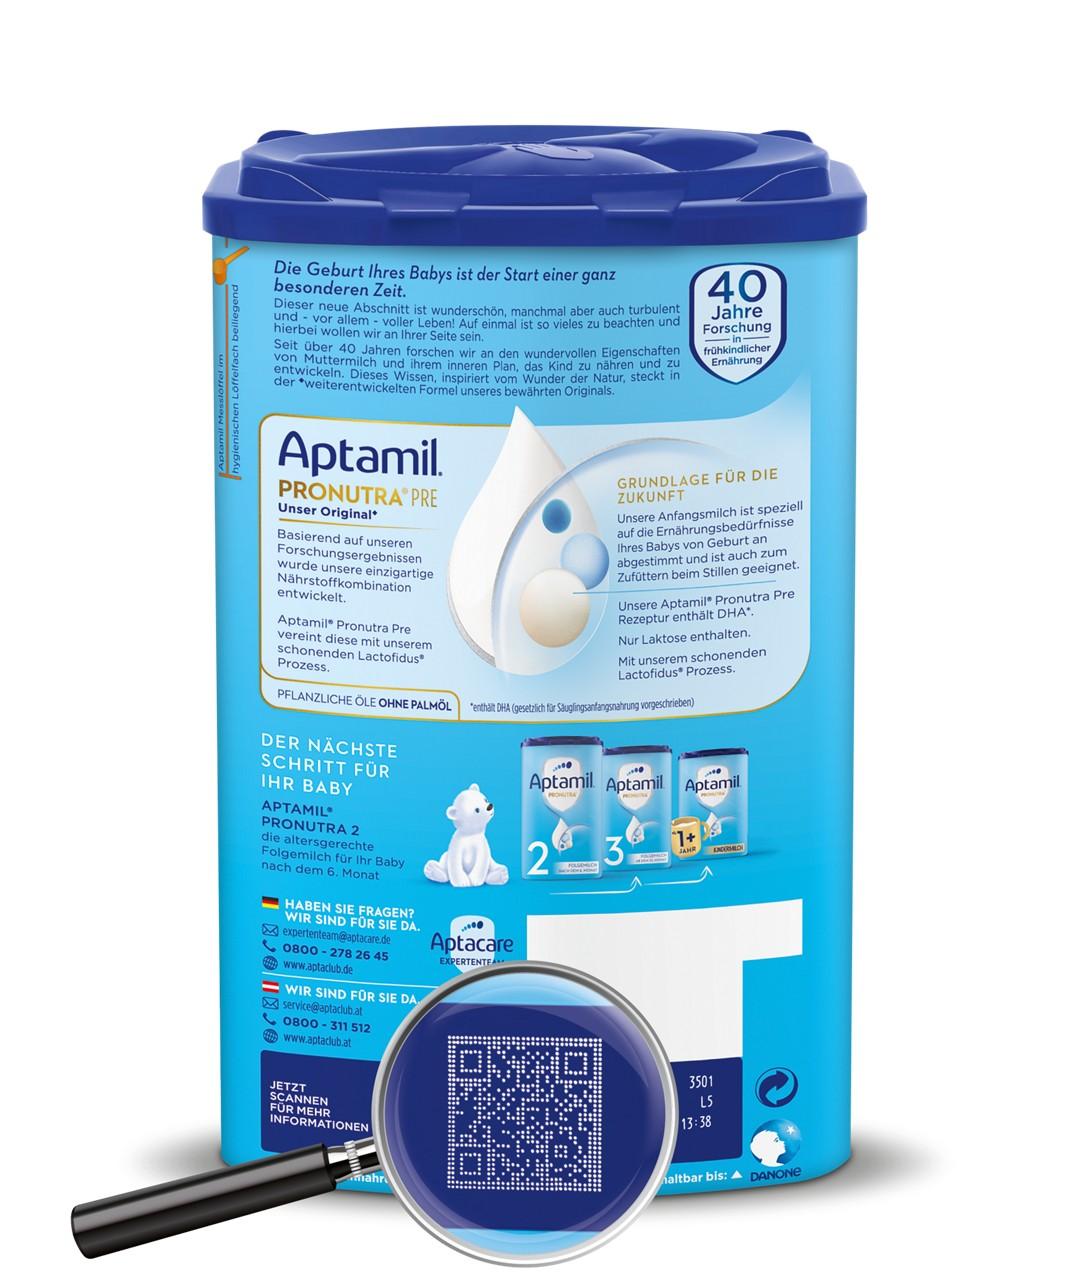 Aptamil EZP BOP ROLEX Code Lupe PRE